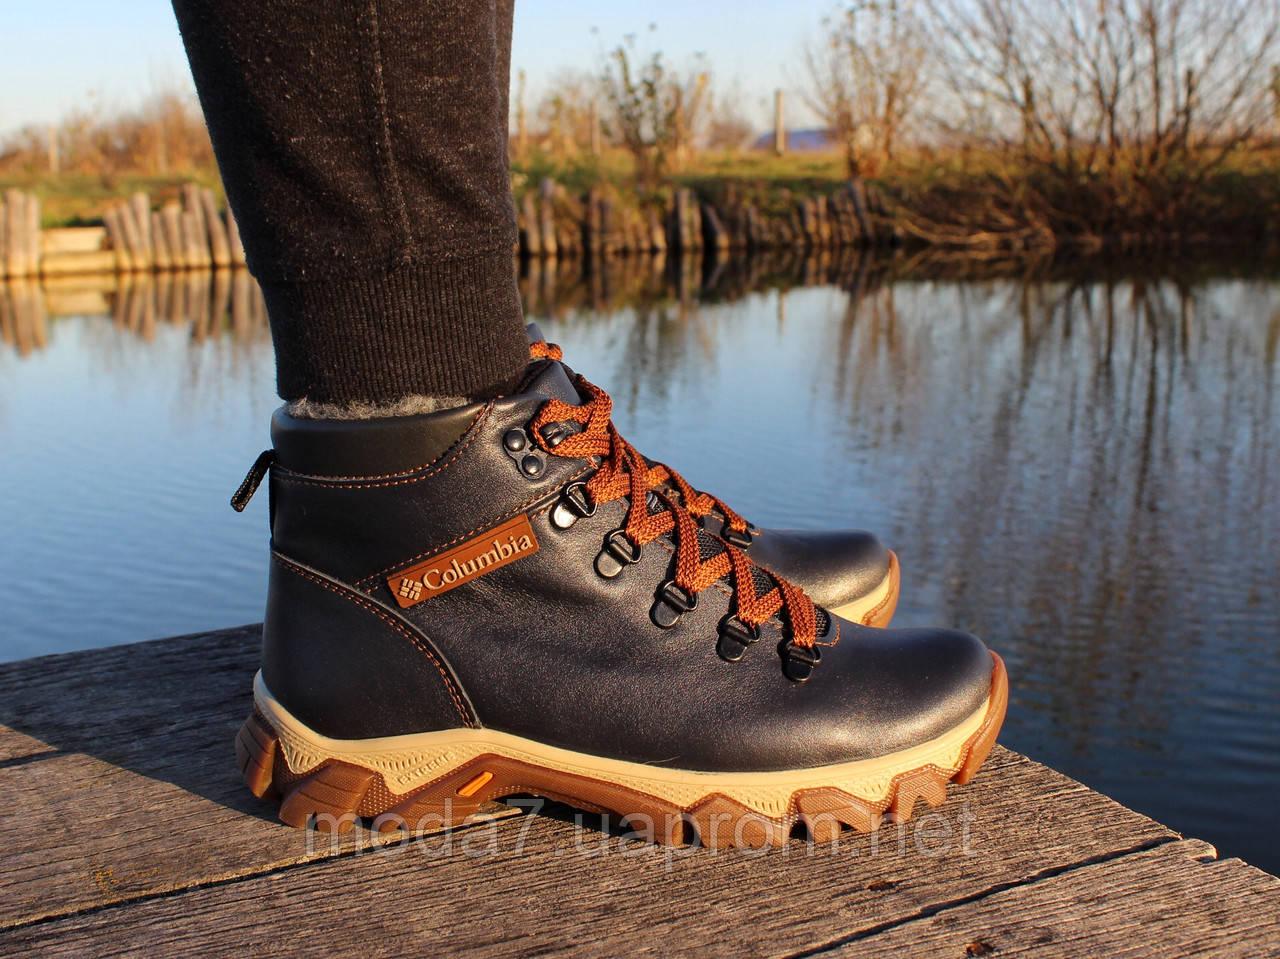 a989277e3 Детские подростковые зимние ботинки Columbia 32,33,34,35,36,37,38,39 ...